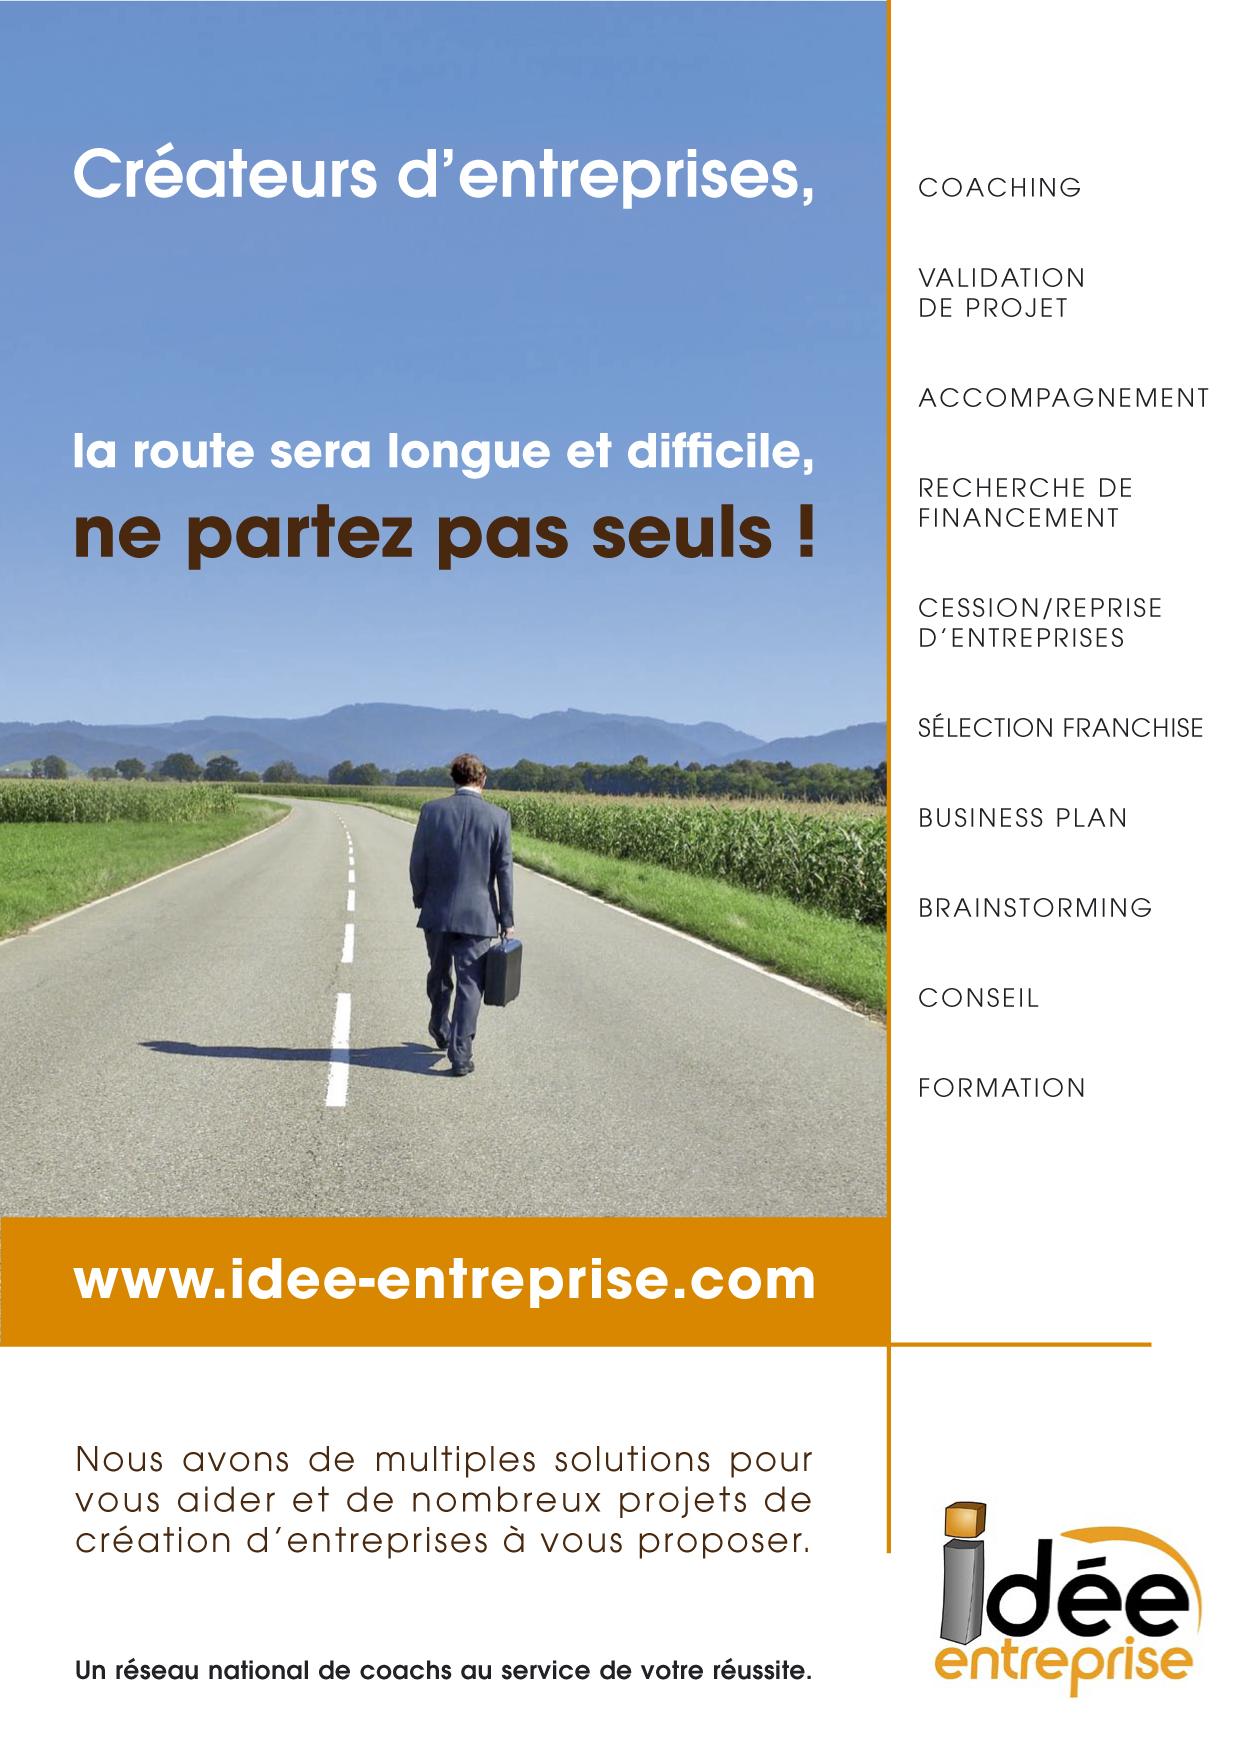 Franchise idee entreprise dans franchise b2b services for Idee entreprise internet